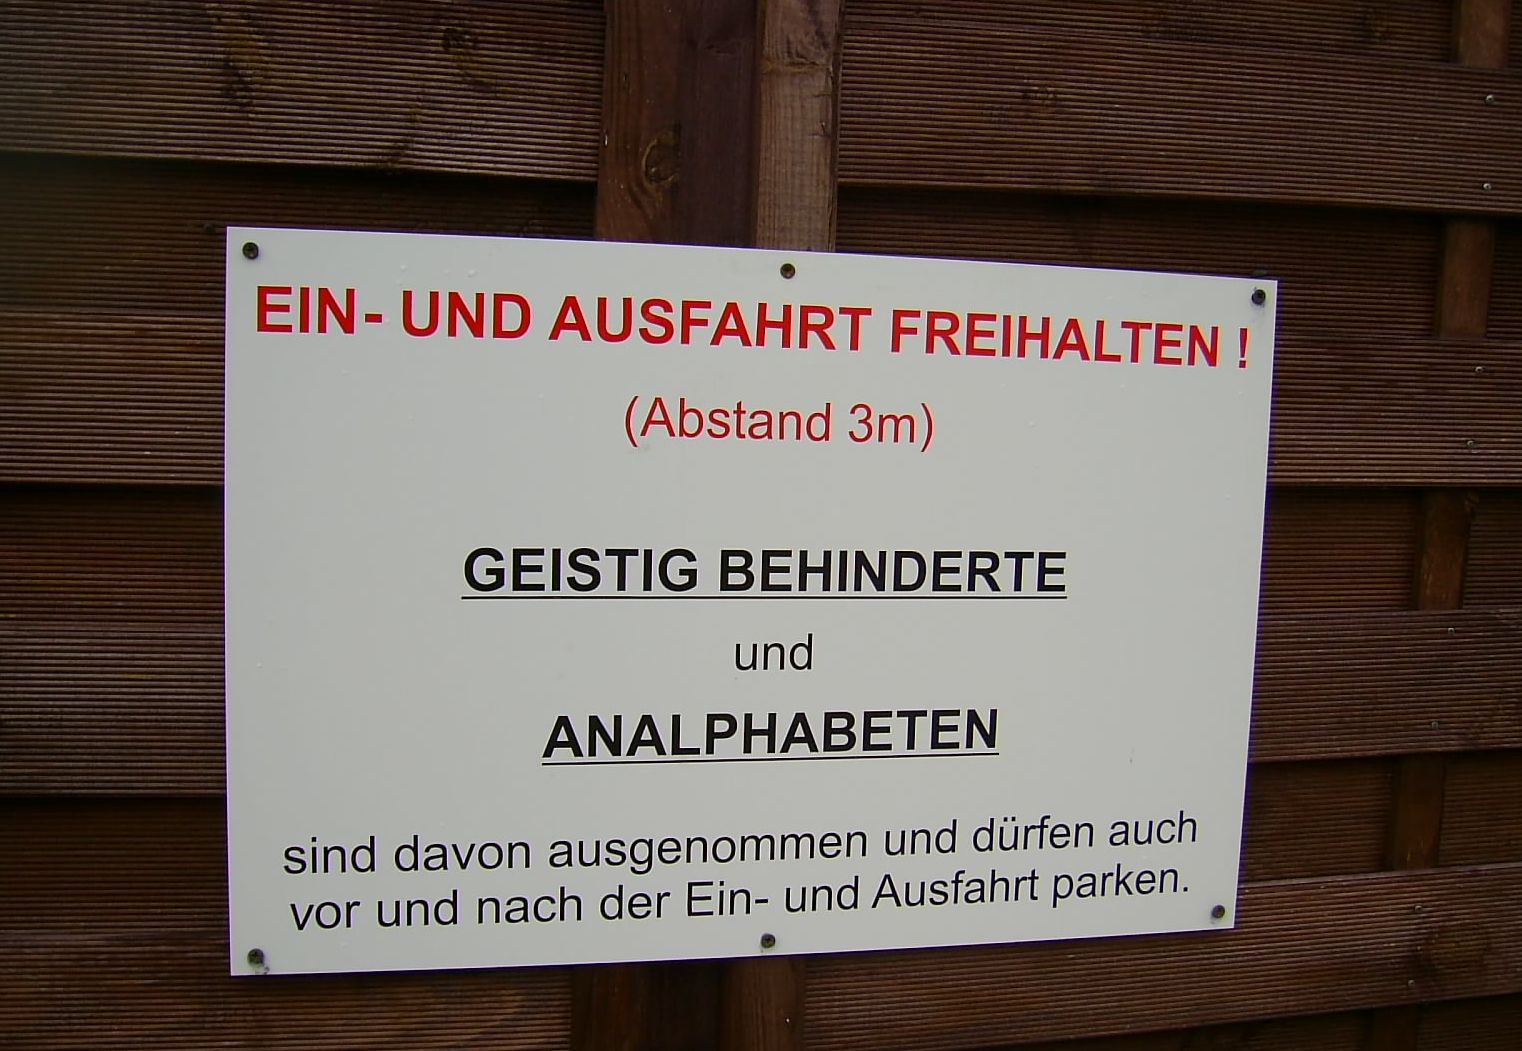 Sichtschutzzaun Welches Holz ~ Flecht Sichtschutzzaun  Tor mit HumorWer einen Sichtschutzzaun in der